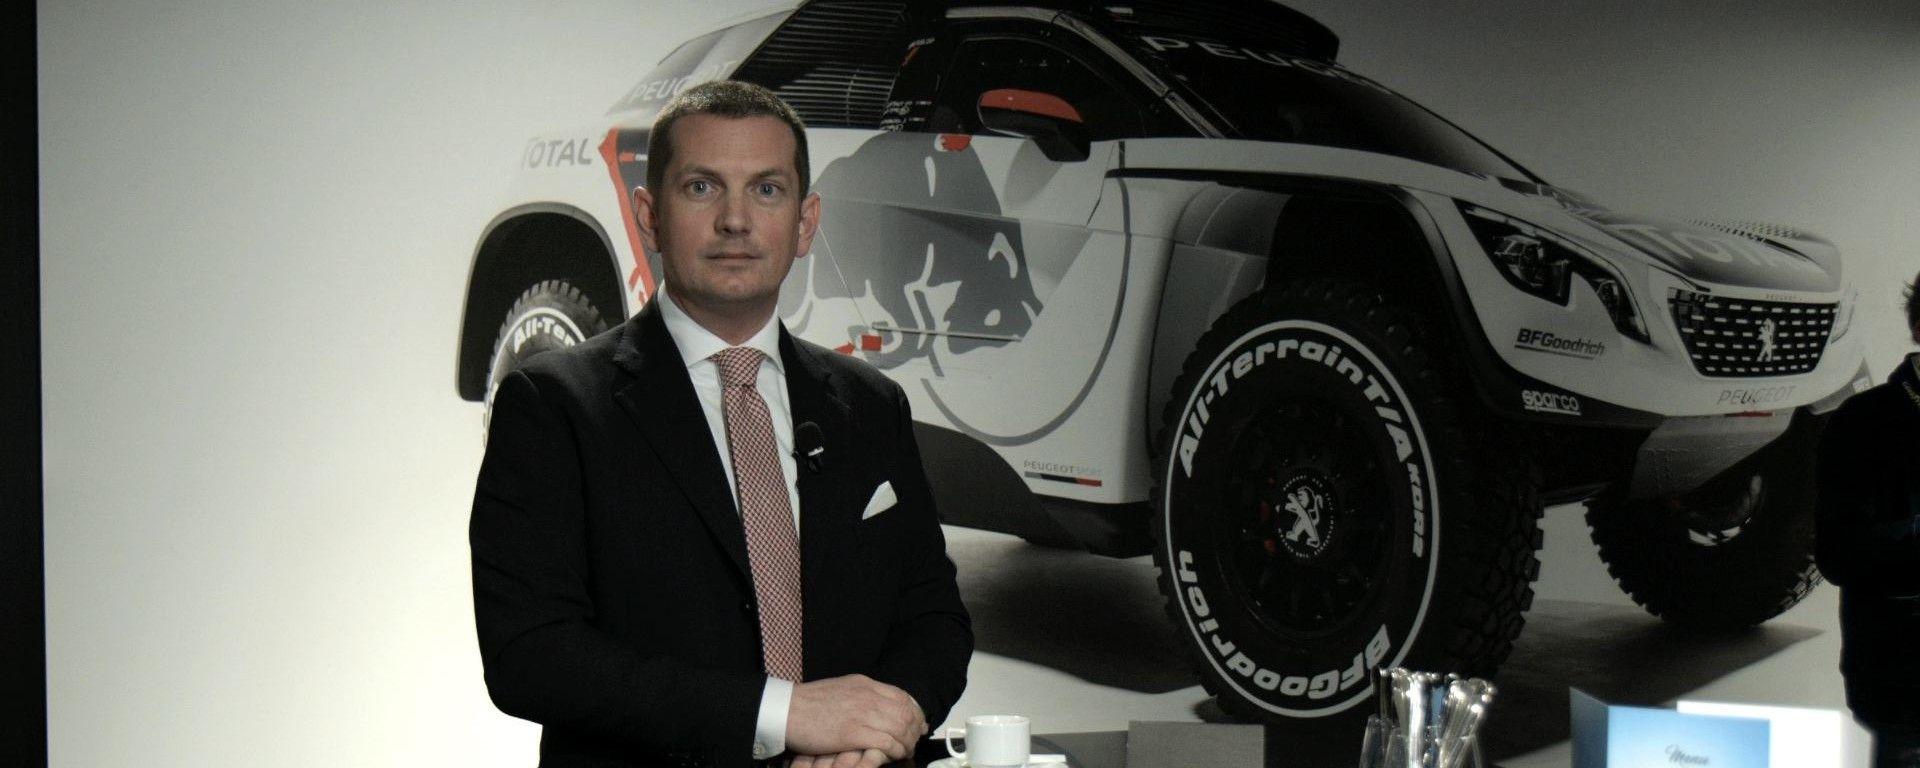 Giulio Marc D'Alberton, Responsabile Comunicazione Peugeot Italia